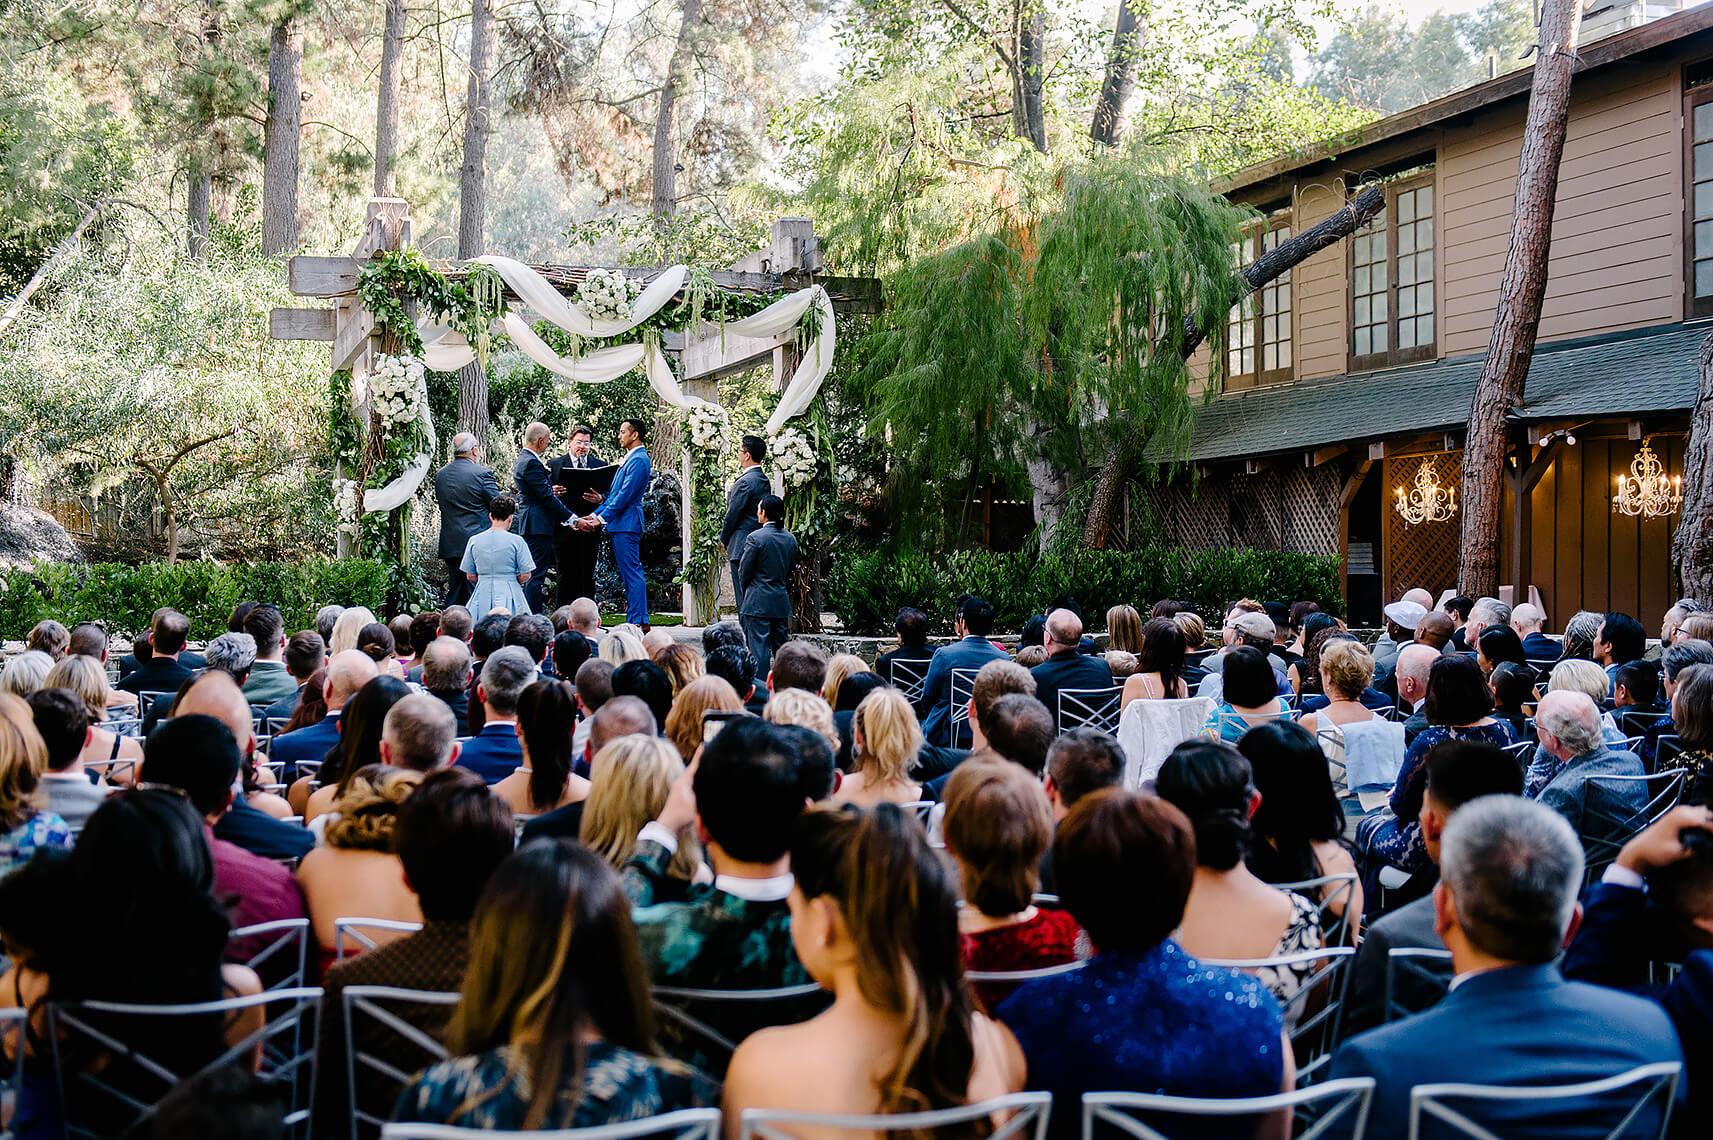 malibu-calamigos-ranch-same-sex-wedding-photographer-los-angeles-11.jpg